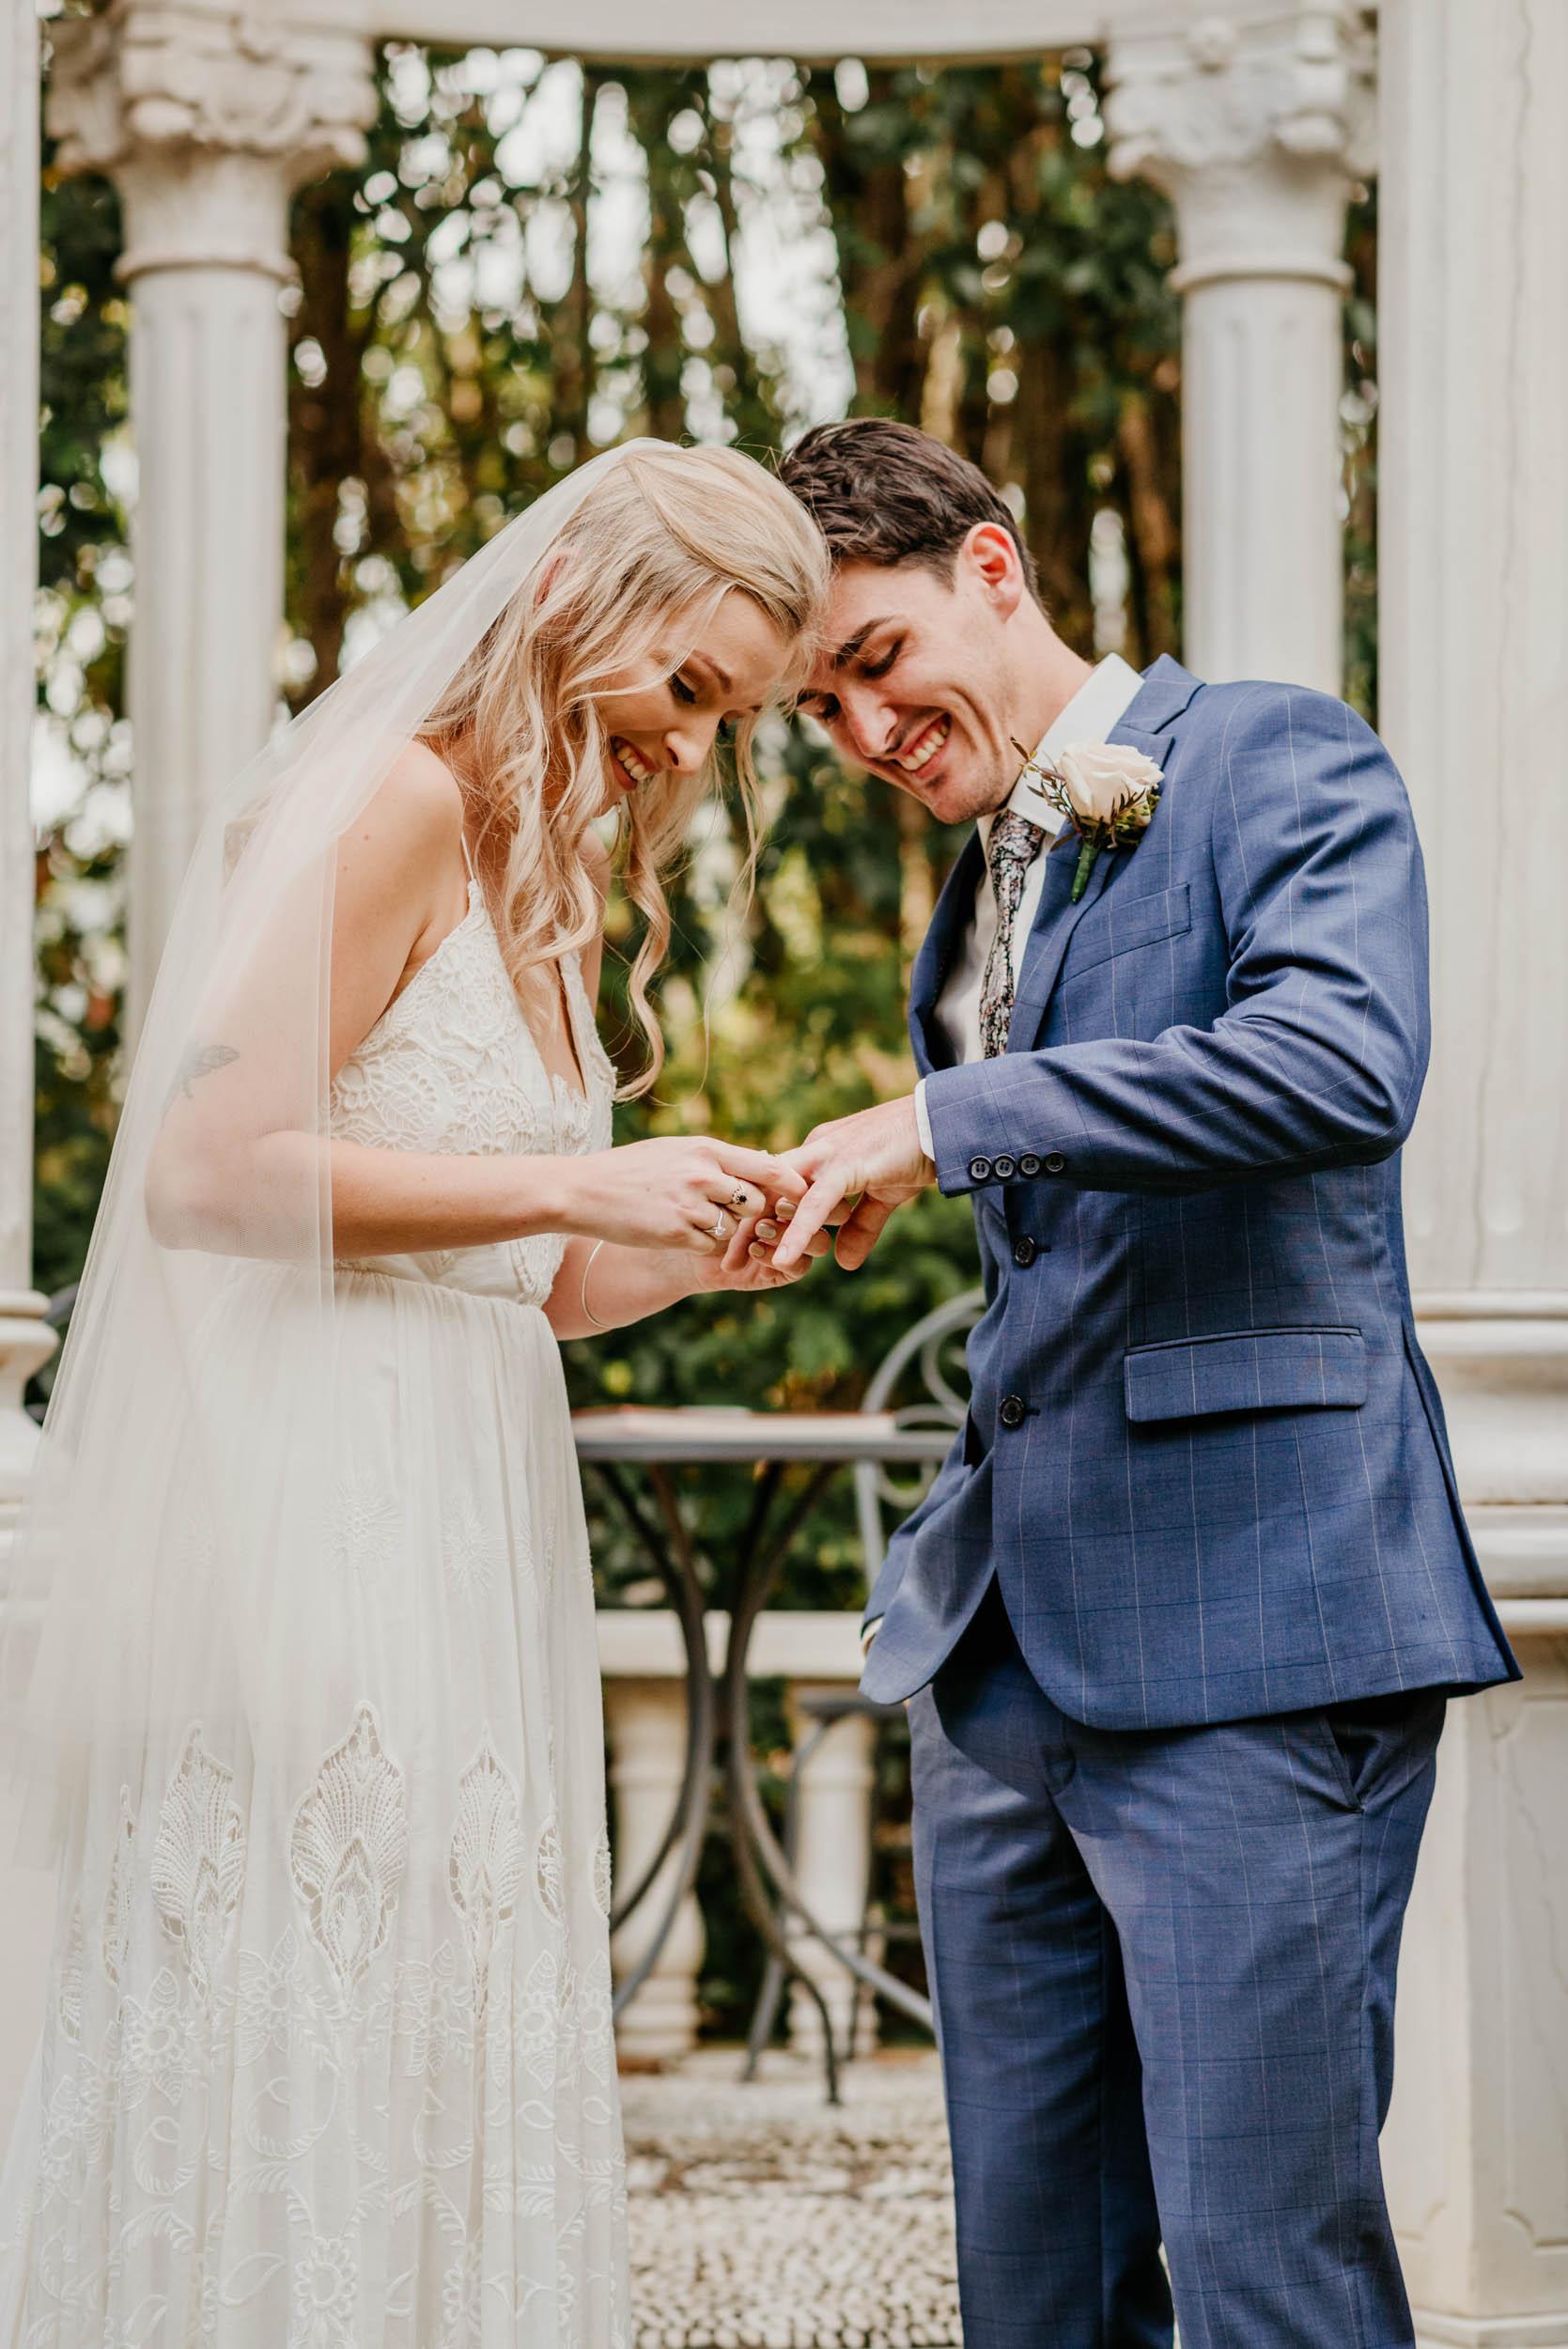 The Raw Photographer - Cairns Wedding Photographer - Laloli - Cairns Garden Wedding - Wedding Dress-44.jpg